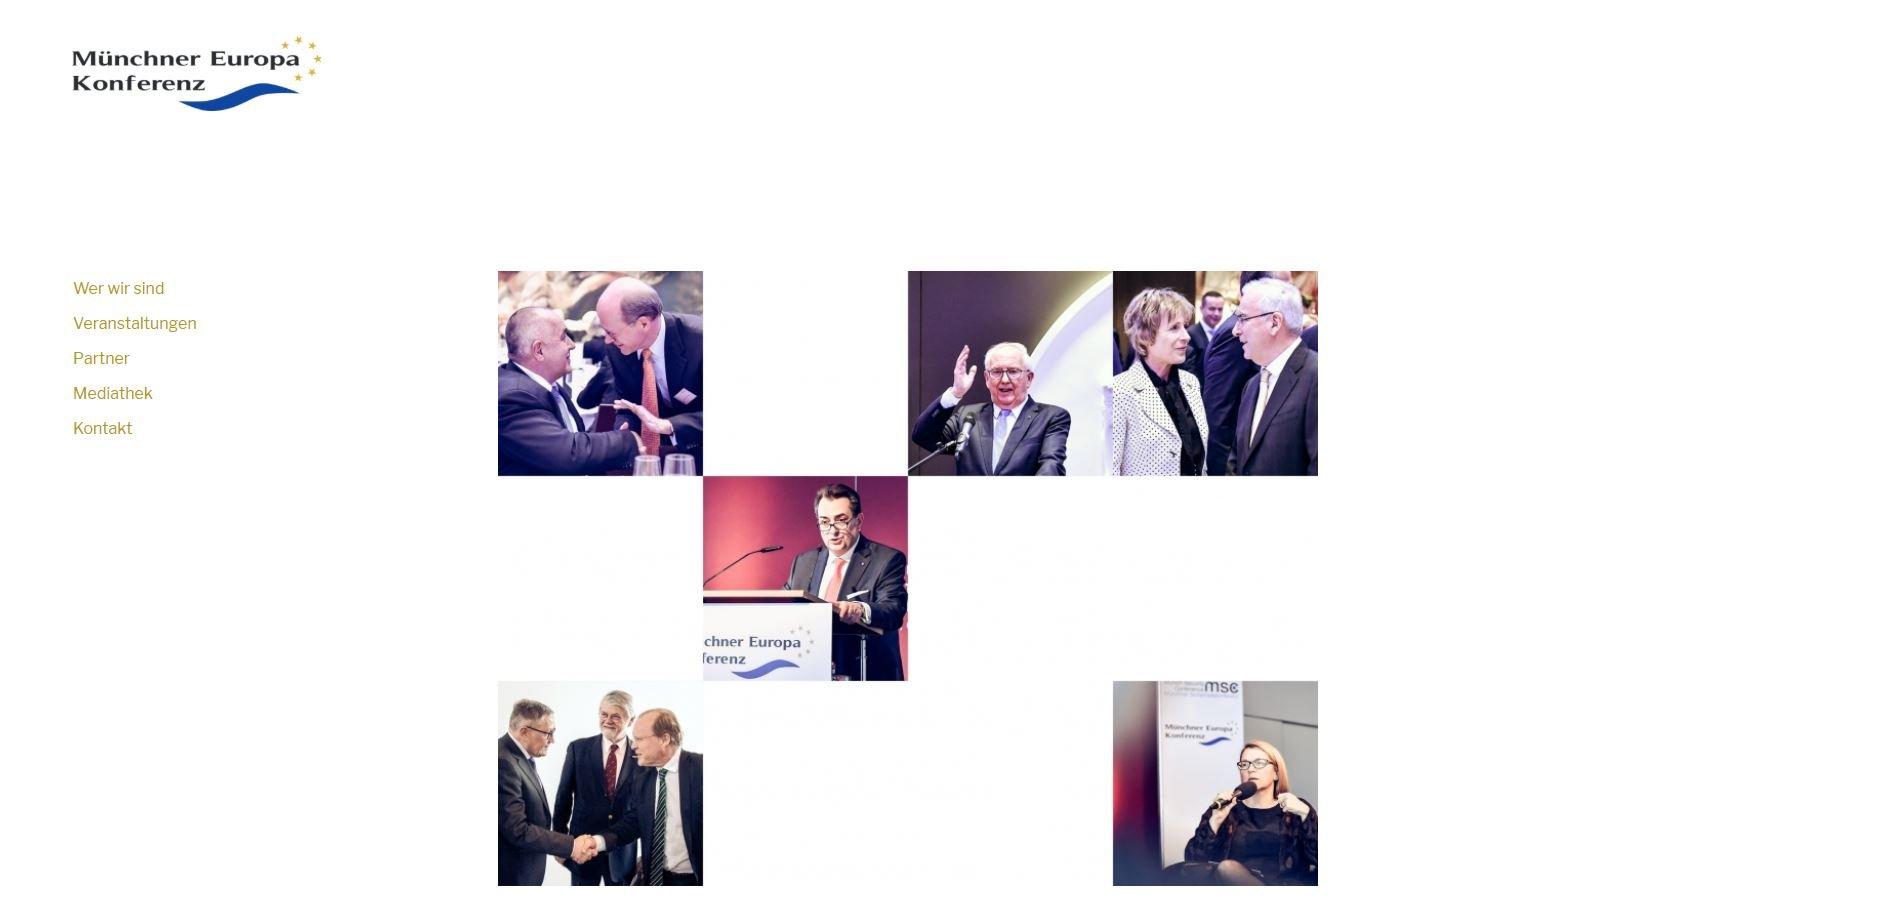 muenchner europa konferenz